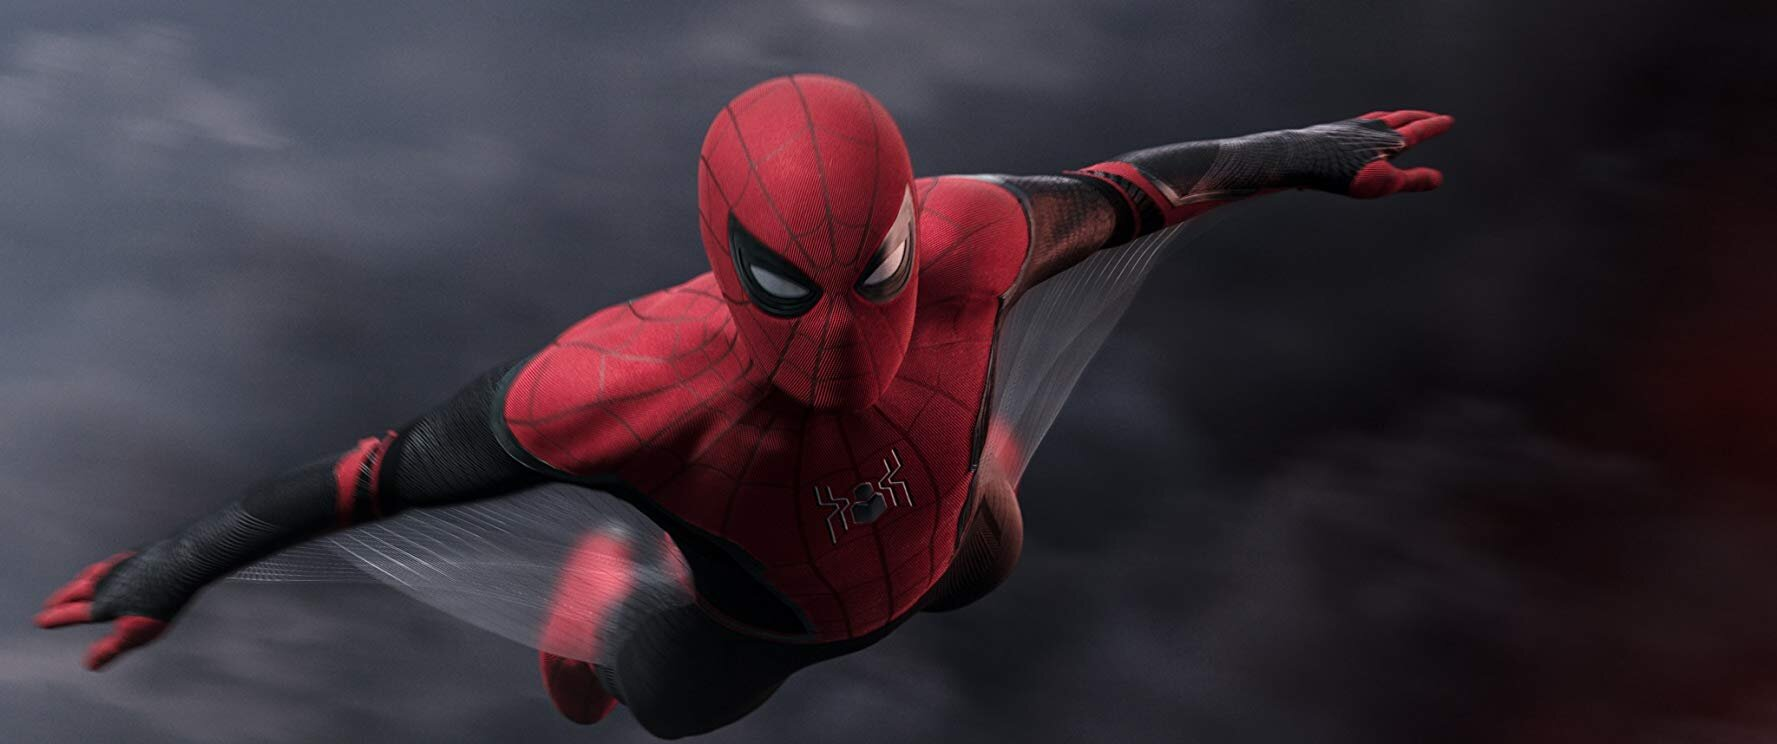 Tom Holland som Spider-Man i Spider-Man: Far From Home. Opphavsrett: Sony Pictures Entertainment / Foto:  IMDb